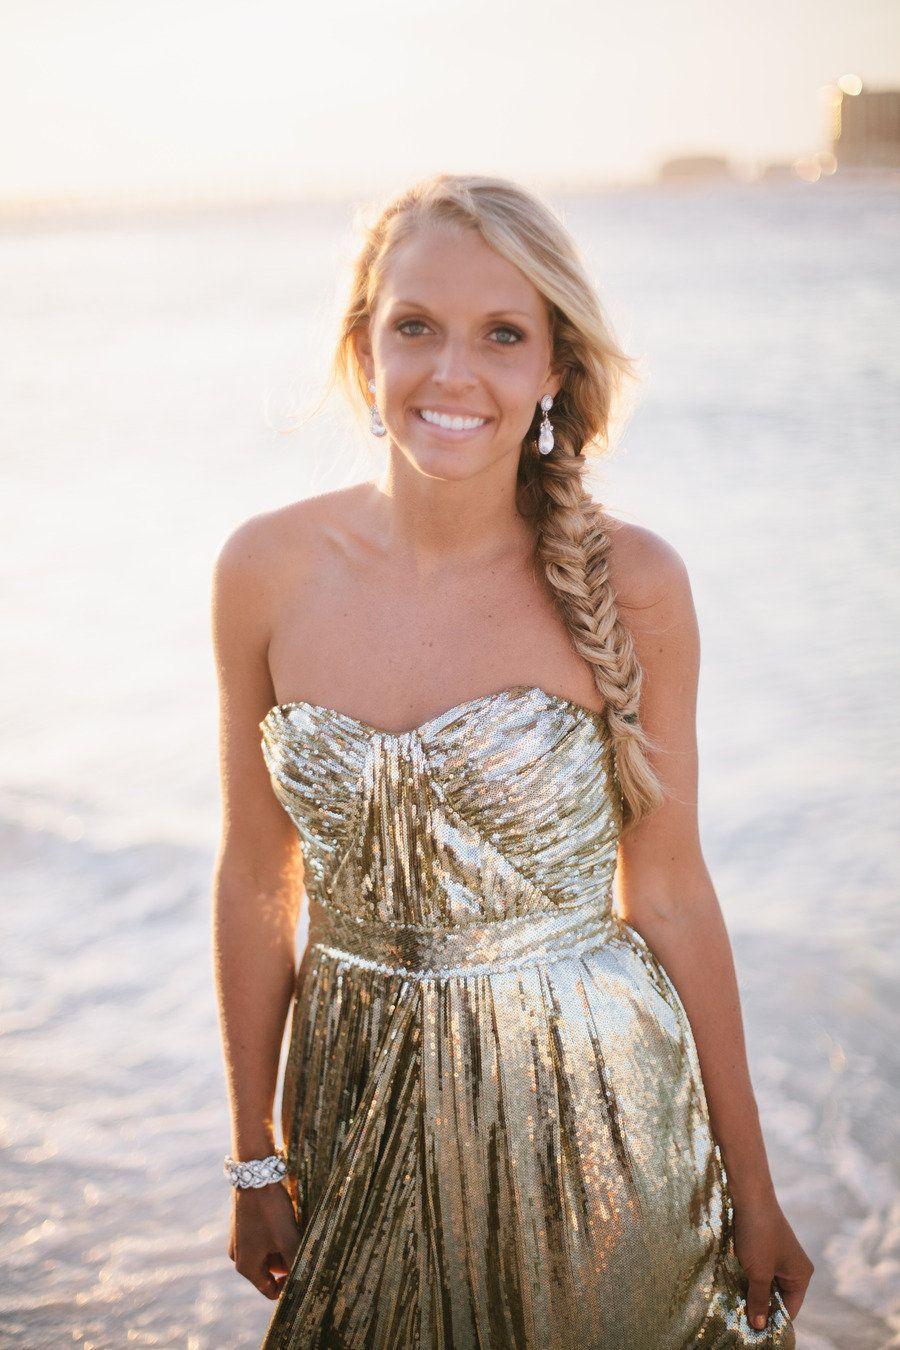 destin beach wedding inspiration from simply sarah photography